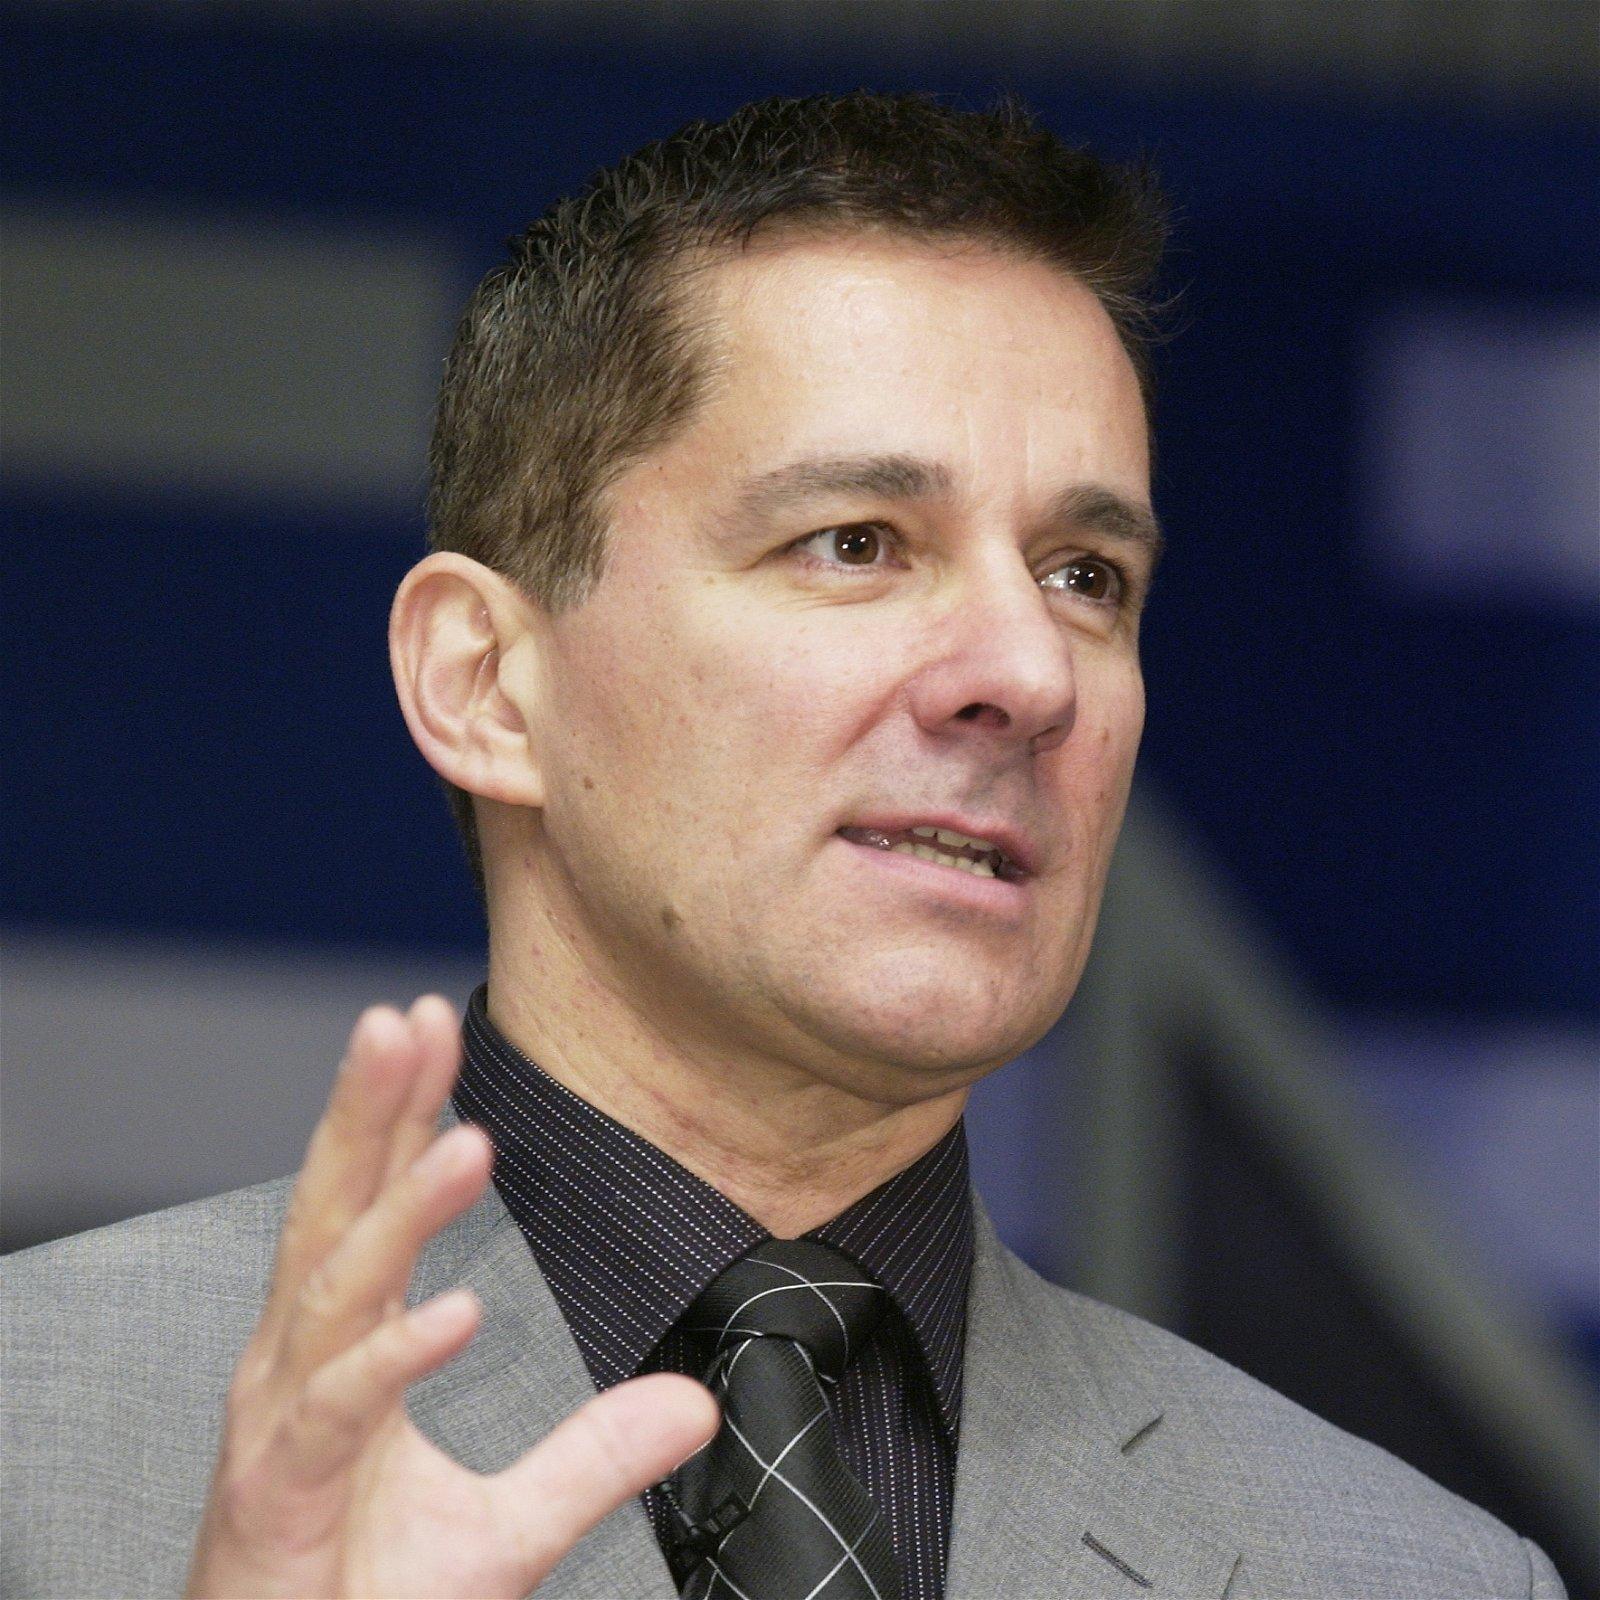 Paul-Coia-Scottish-TV-presenter-corporate-media-coach-host-speaker-at-Great-British-Speakers